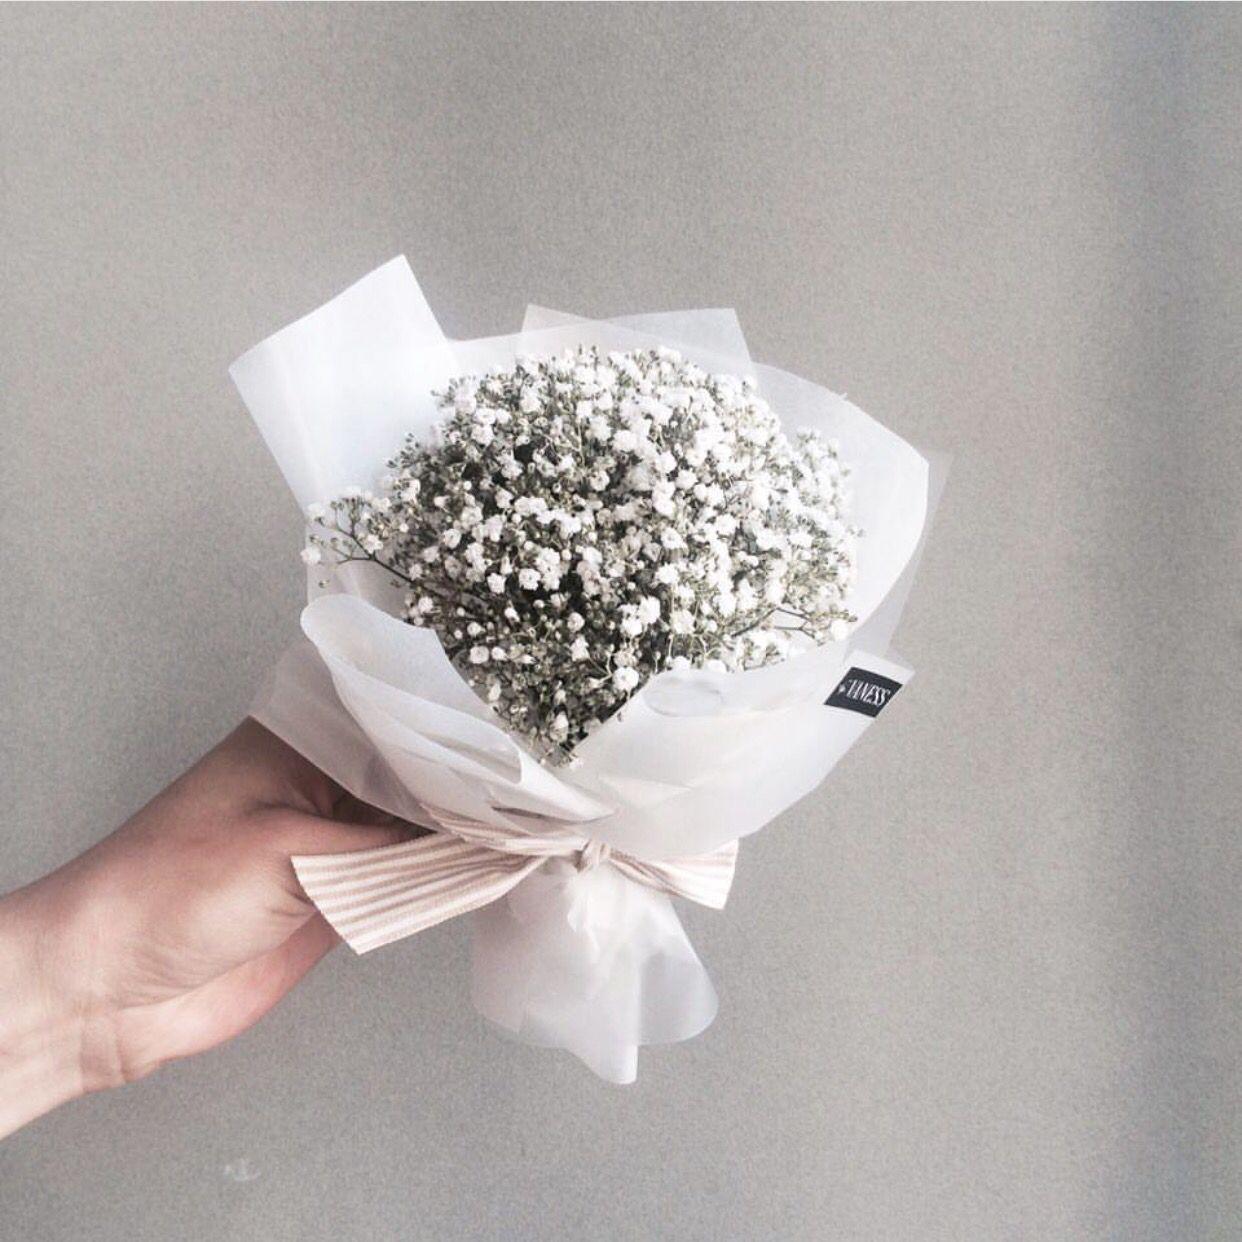 vanessflower   F l o w e r s   Pinterest   Flowers, Flower and Plants